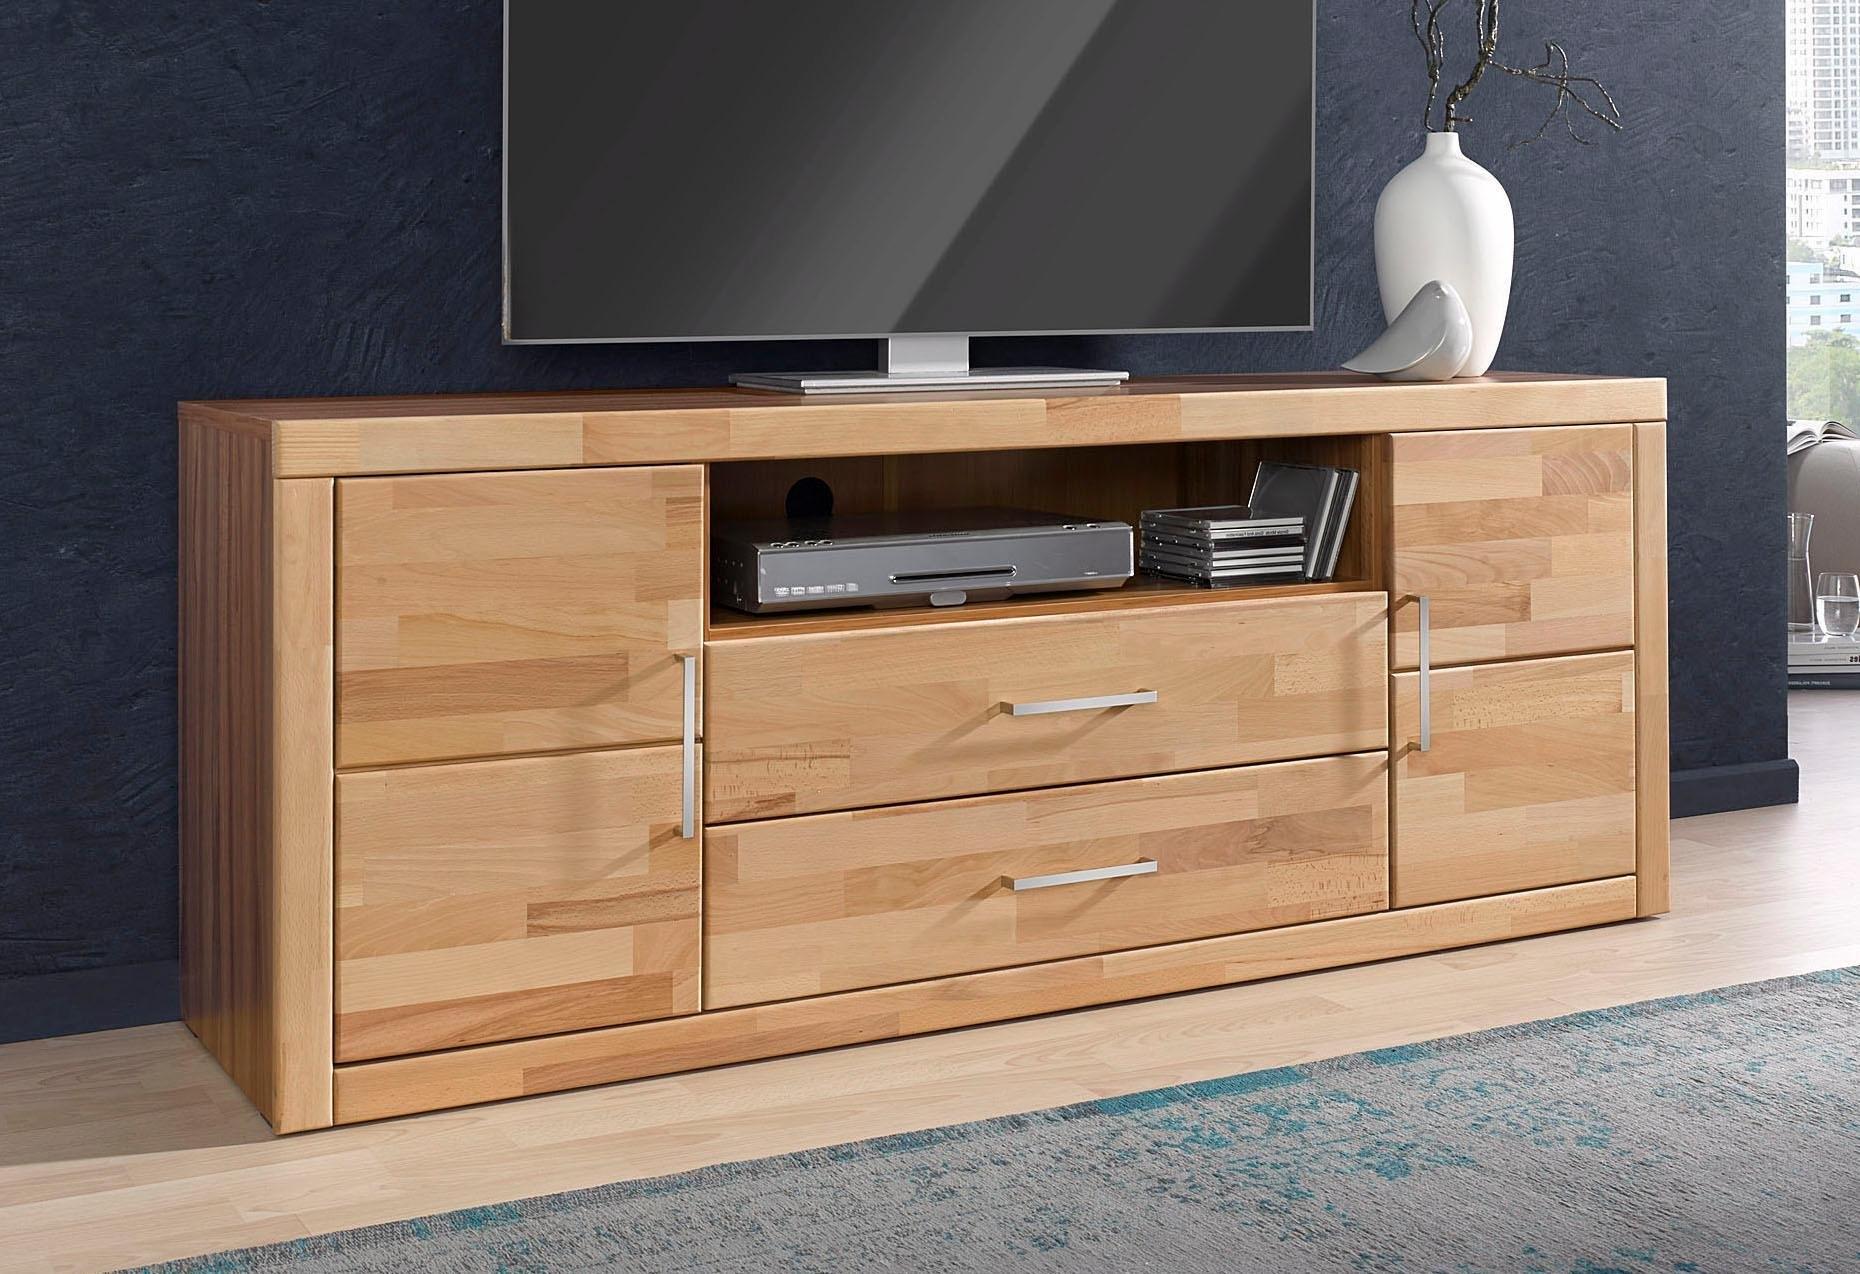 Places Of Style roomed TV-meubel, breedte 160 cm - gratis ruilen op otto.nl